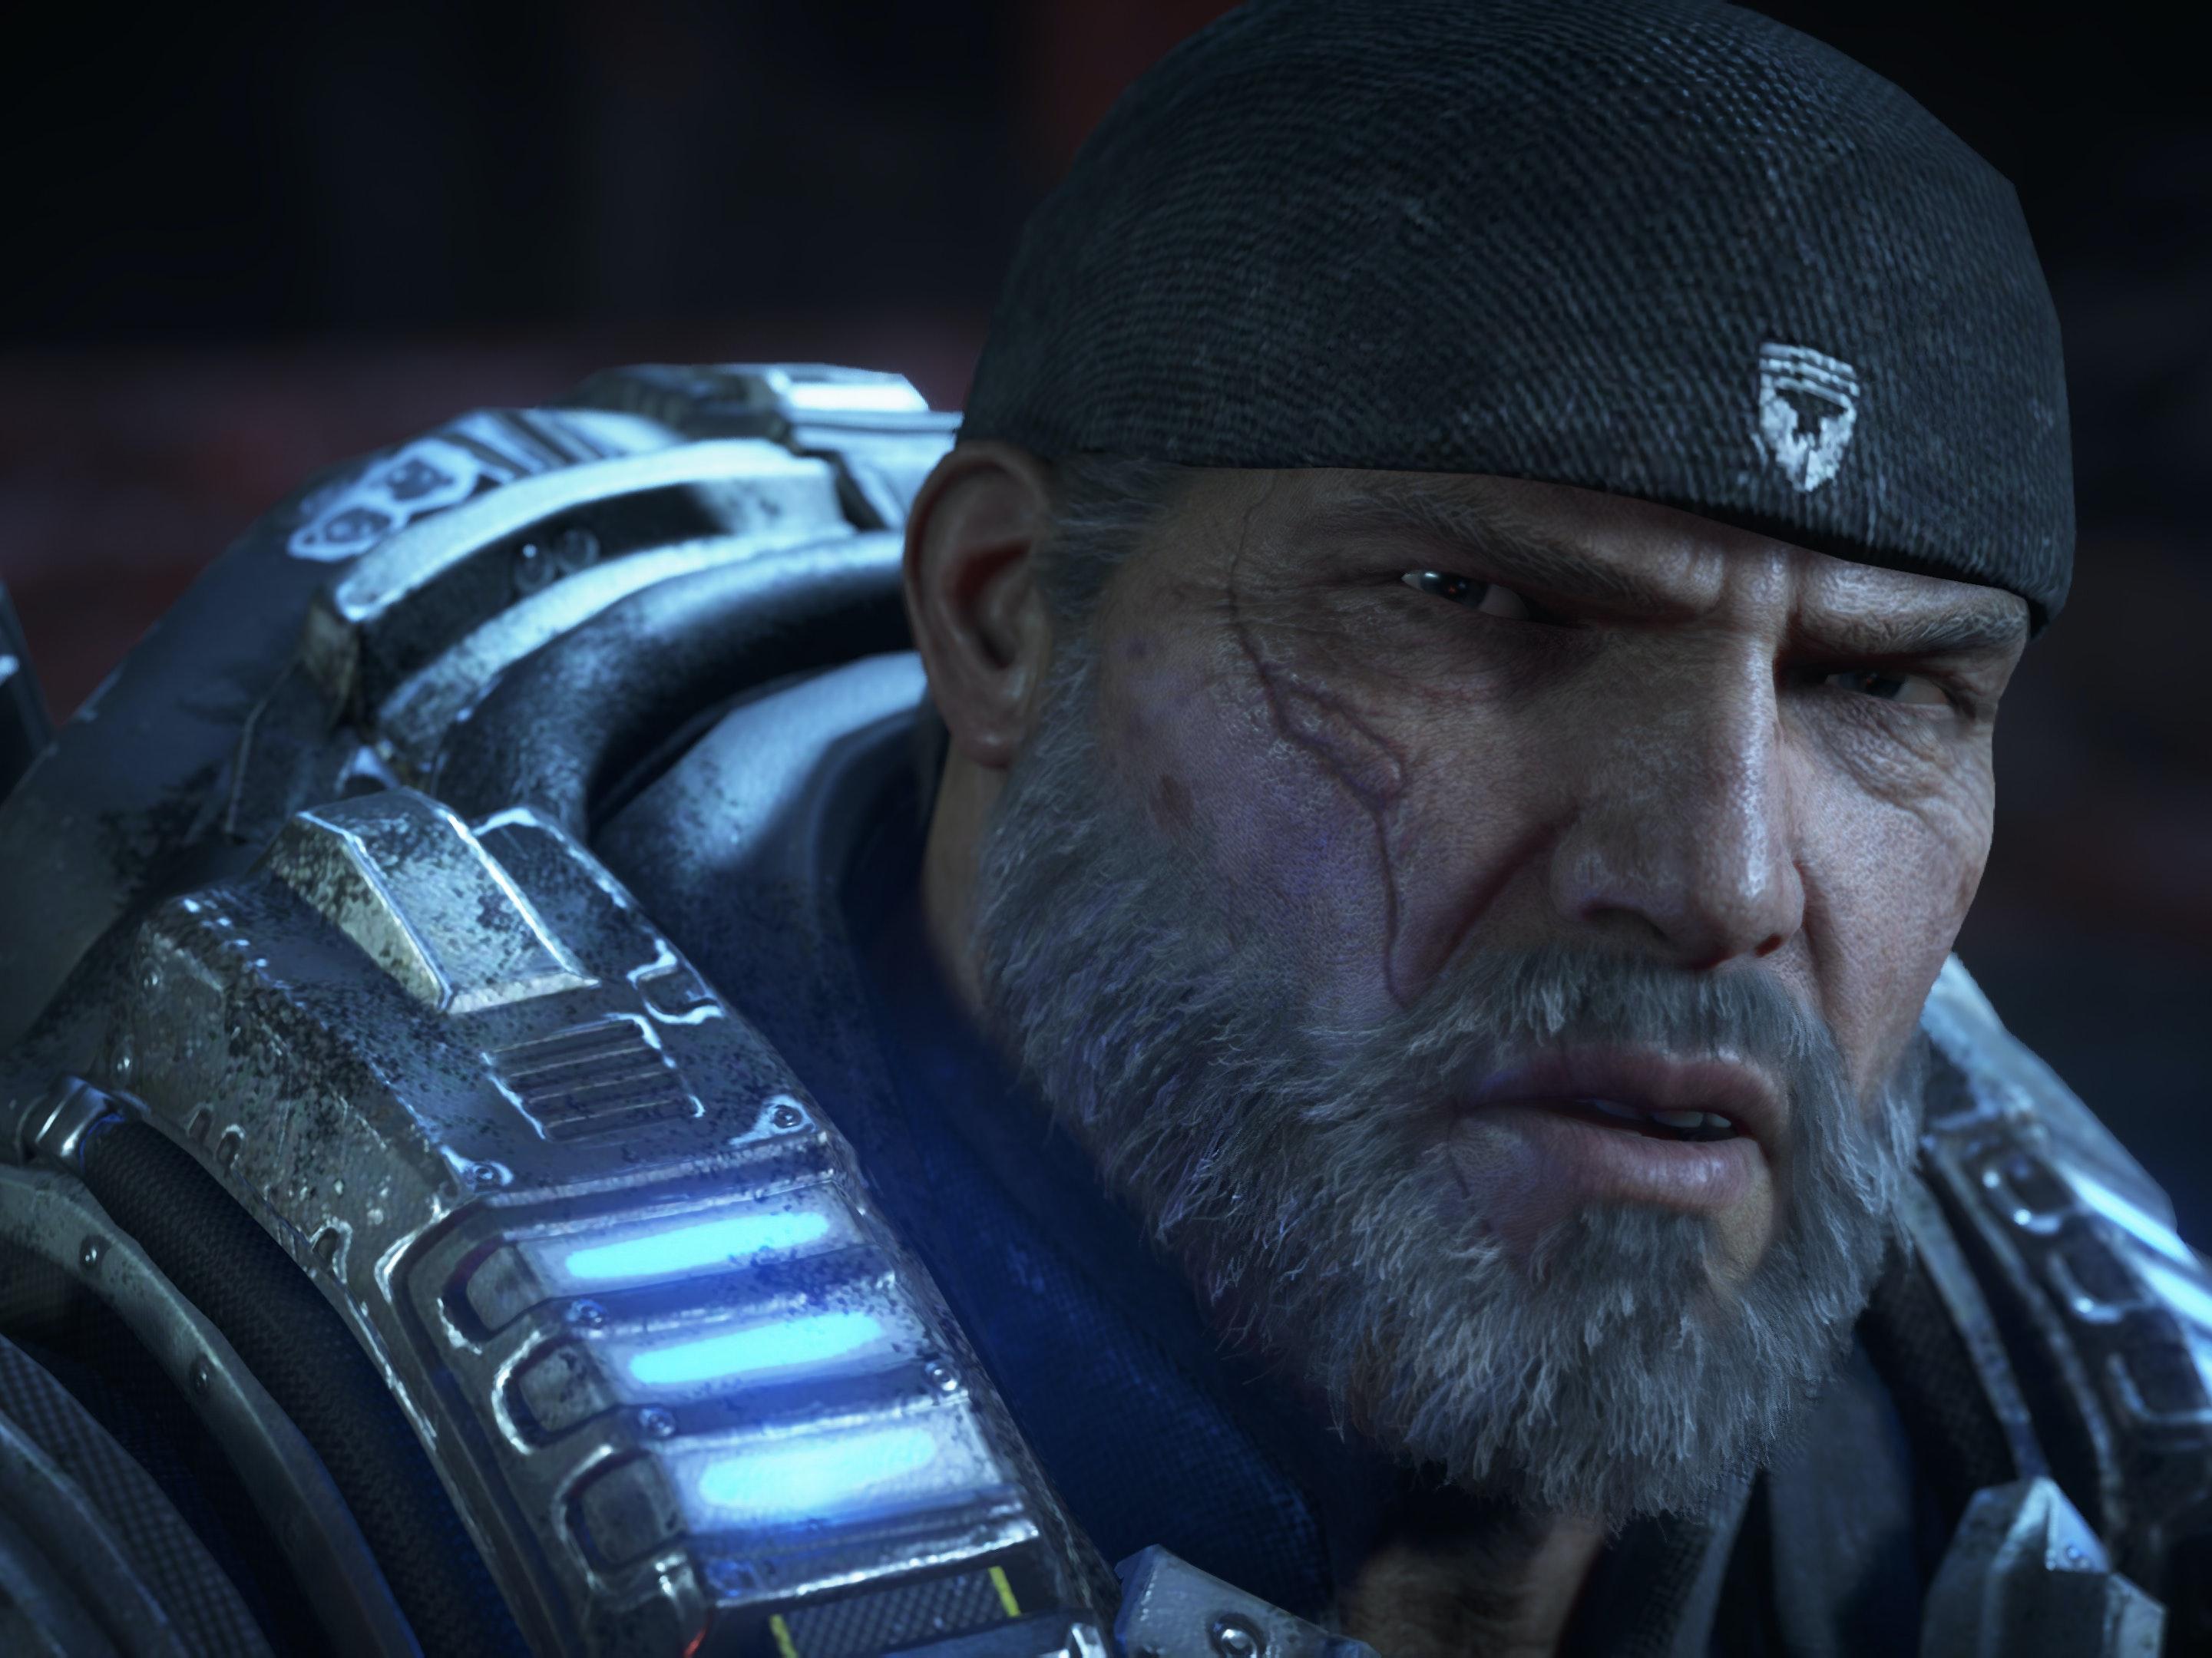 'Gears of War 4' Handles Marcus Fenix's Return Perfectly